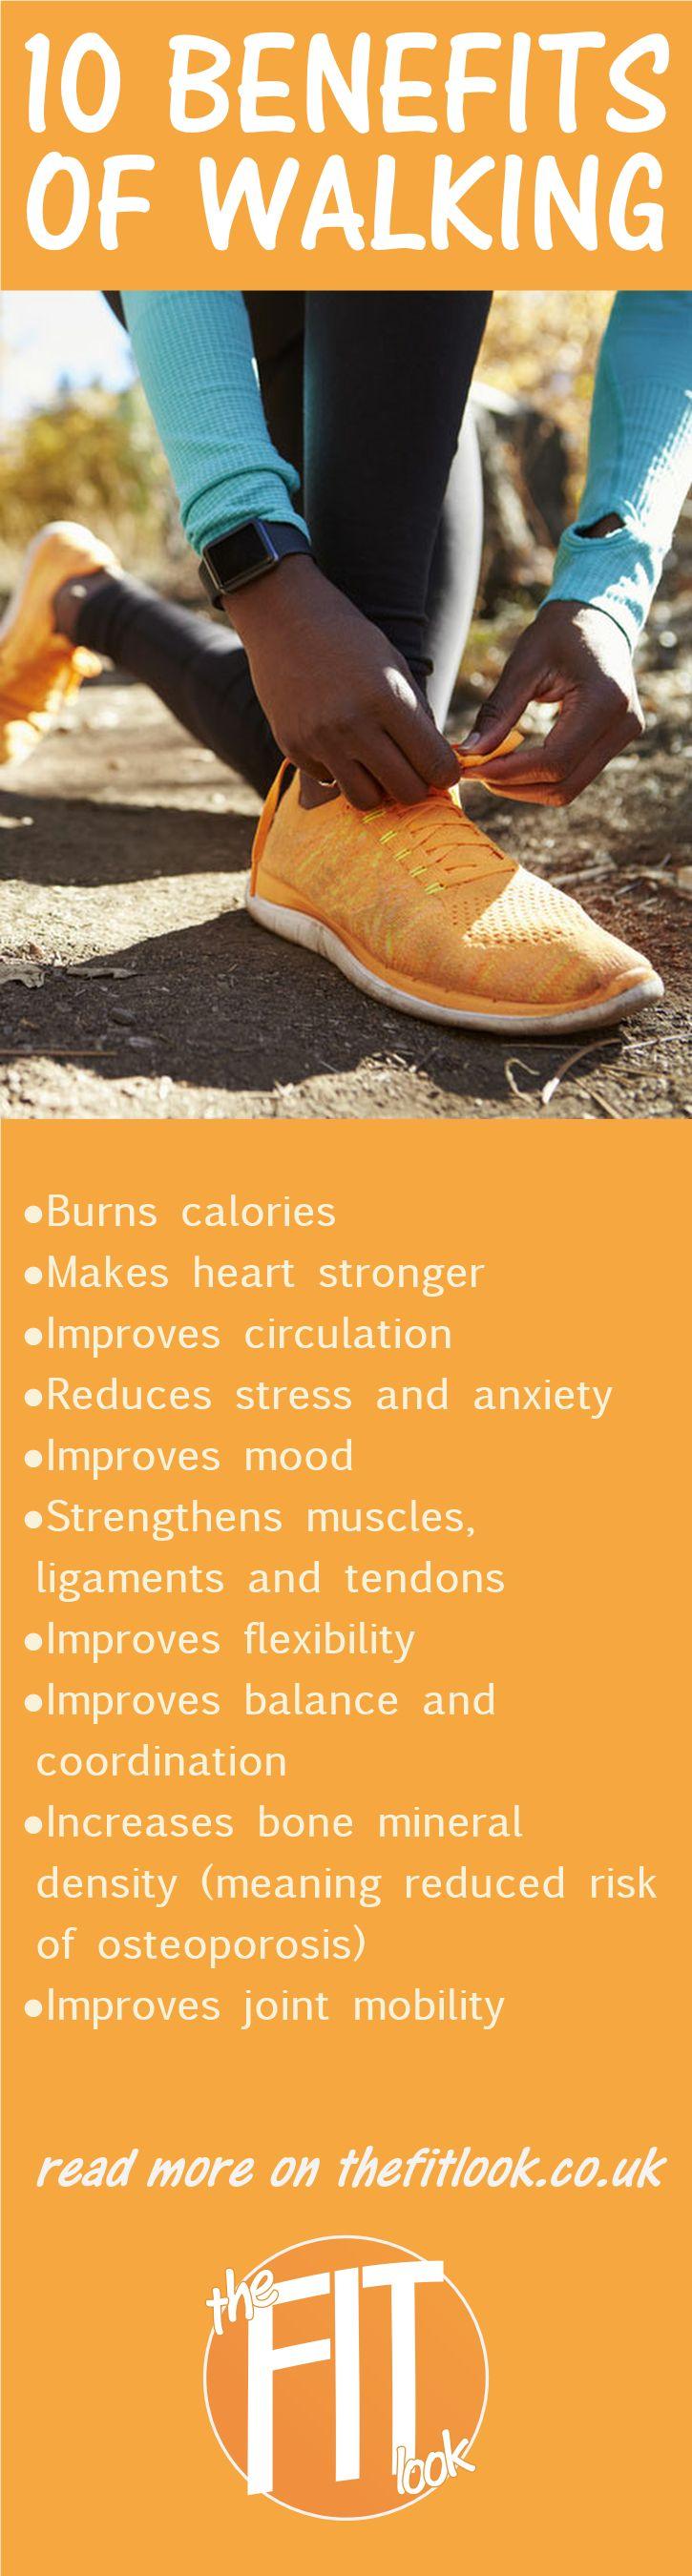 Best 25+ Health benefits of walking ideas on Pinterest ...